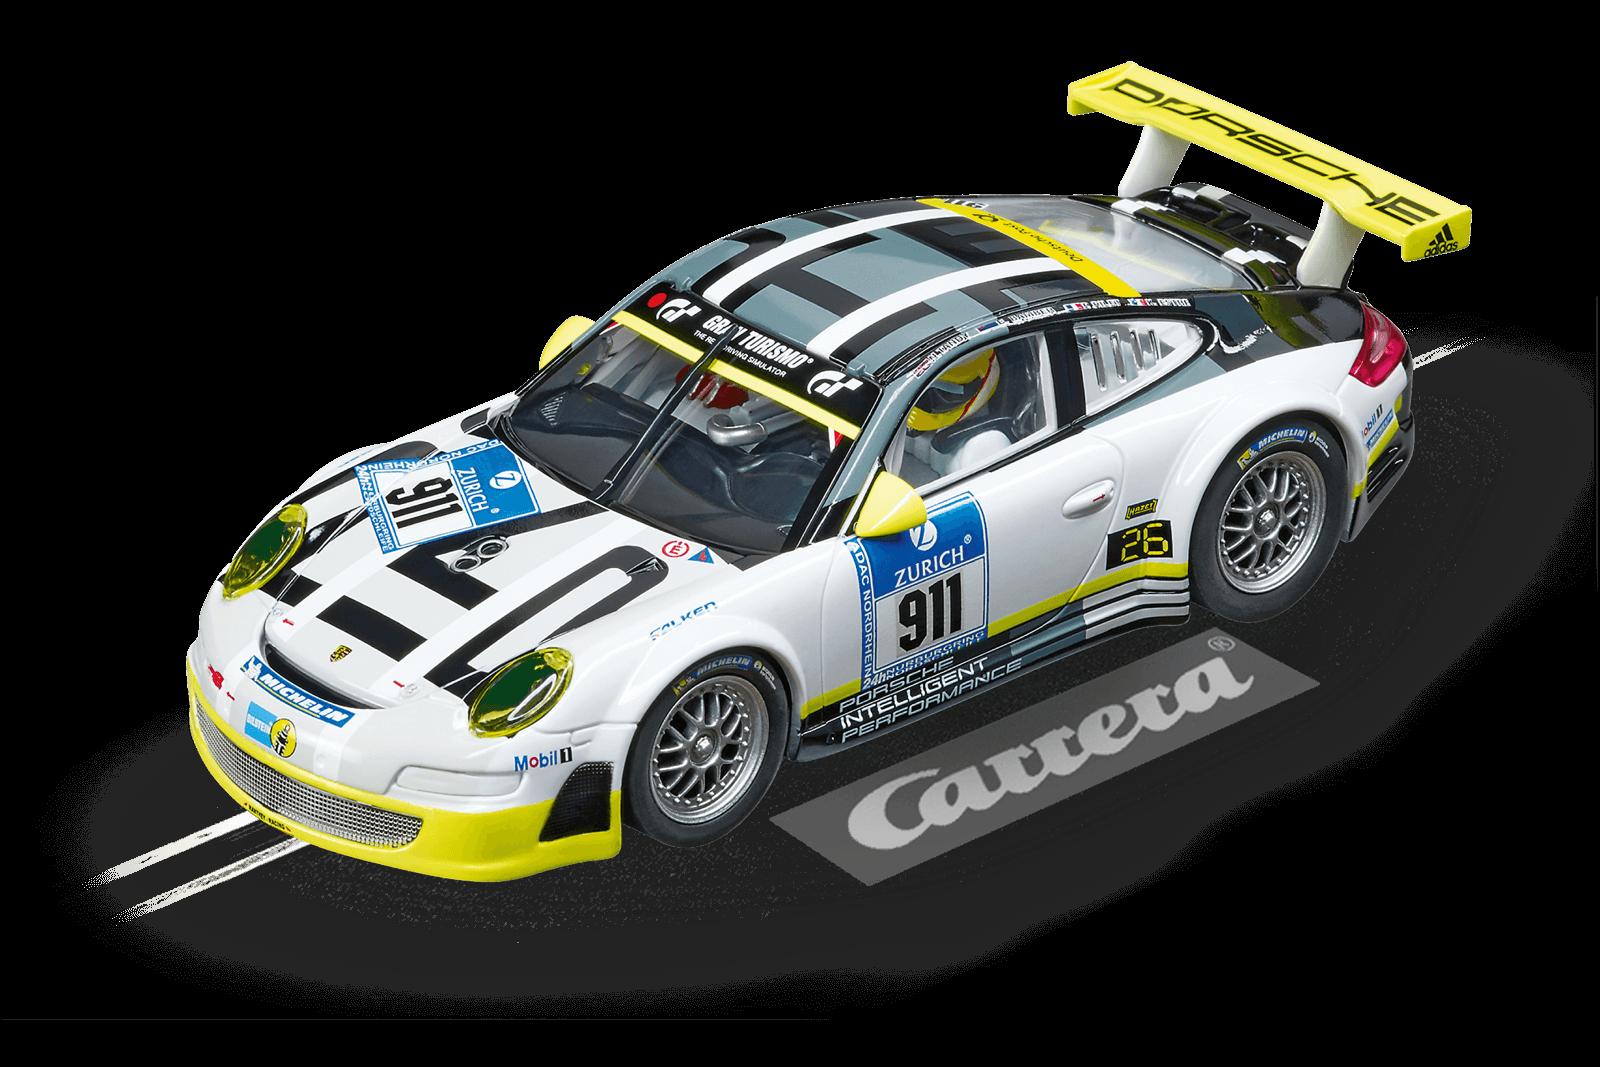 Porsche 911 Gt3 Rsr Manthey Racing Livery 20027543 Carrera Slotcar Rc